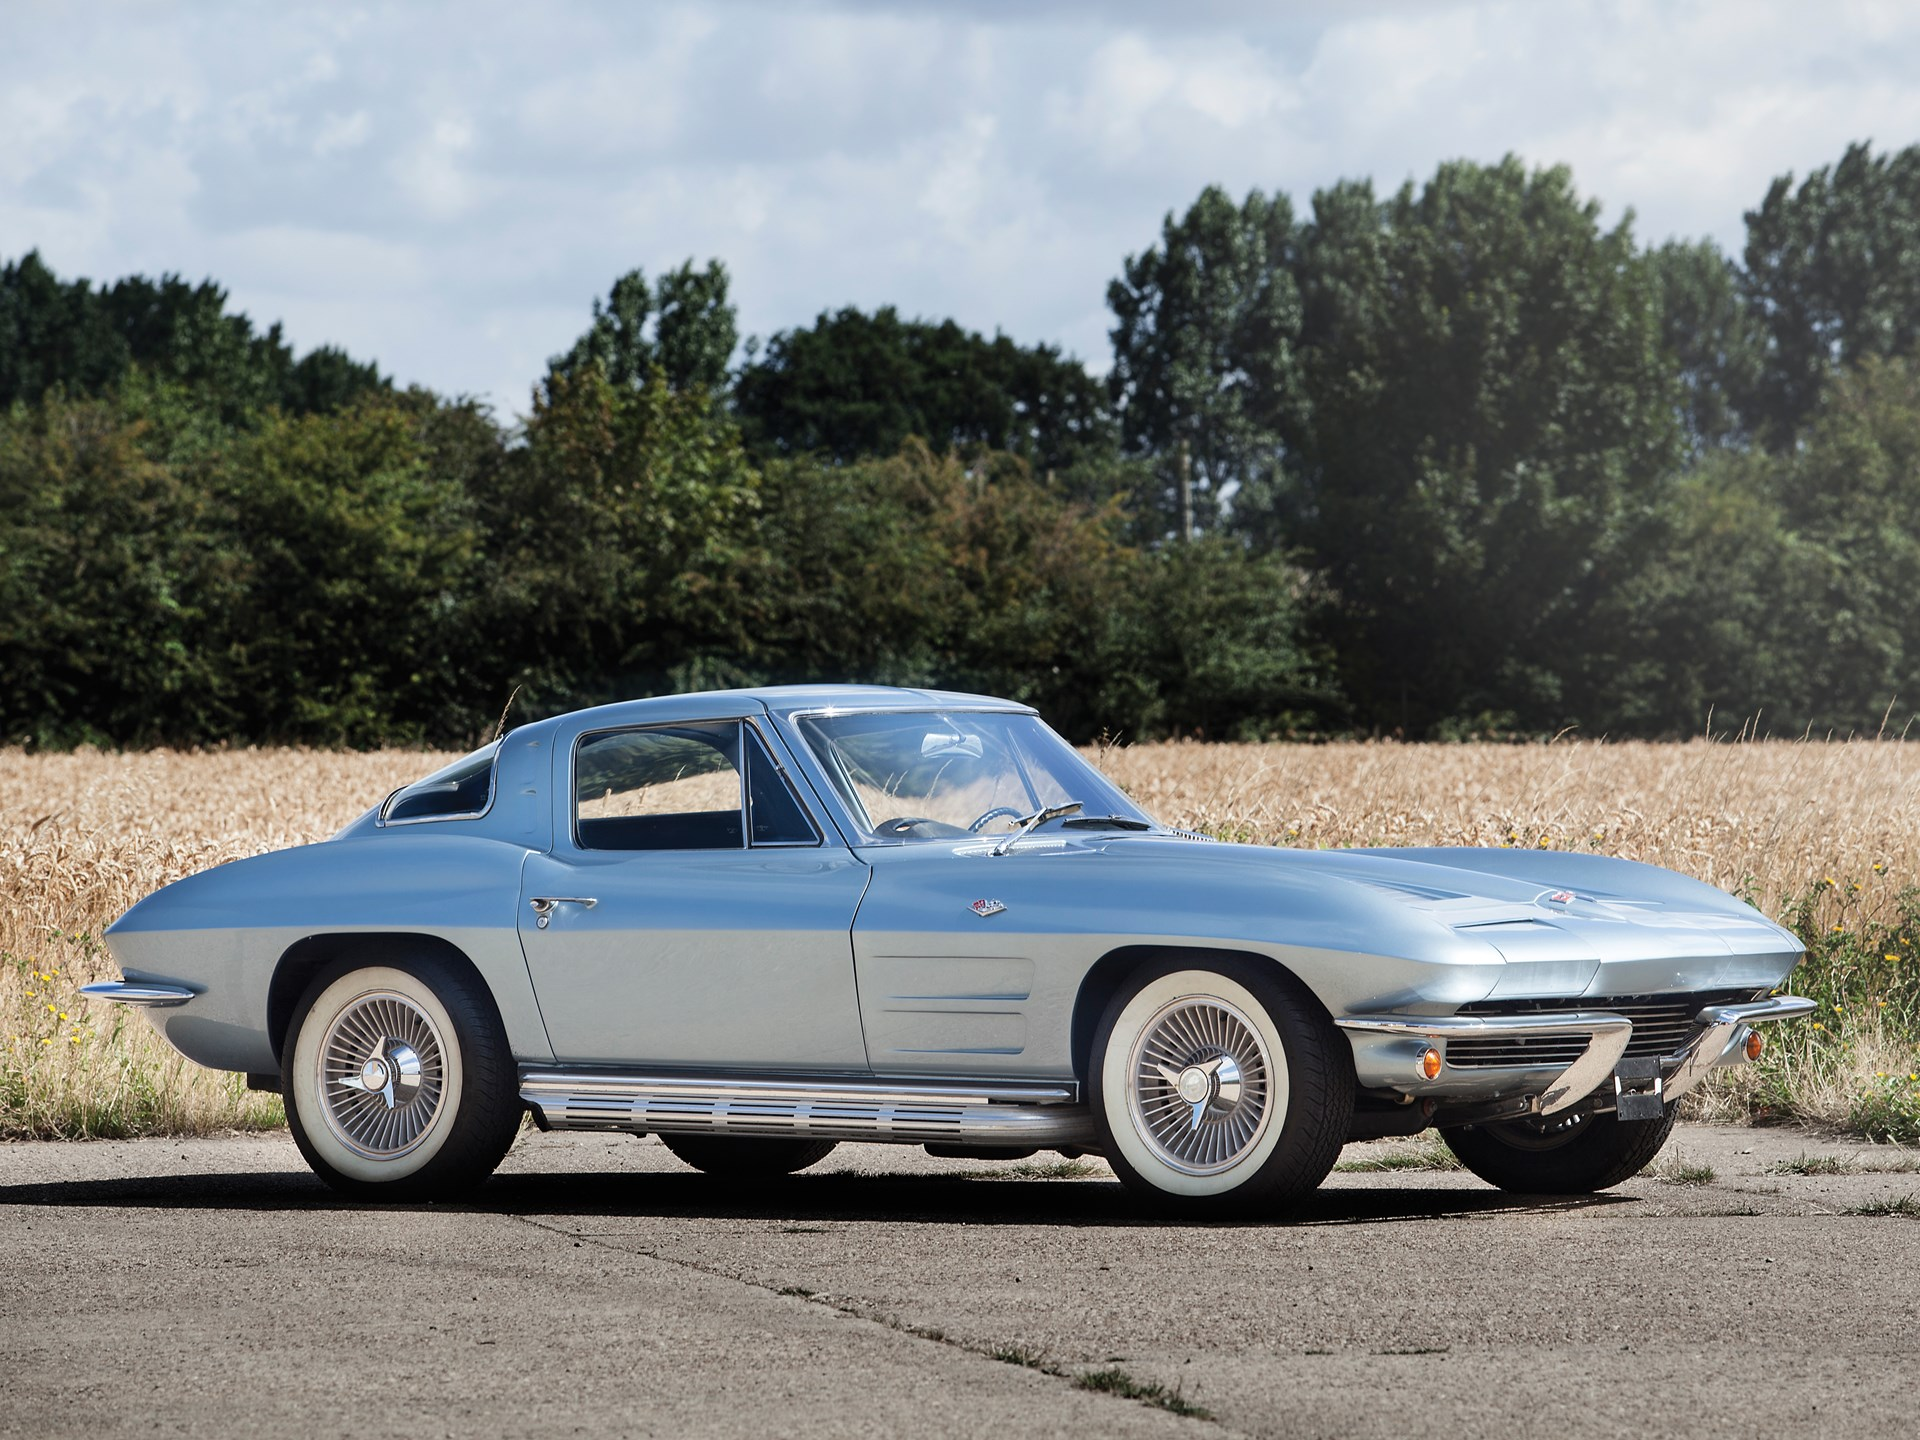 63 Split Window Corvette >> Rm Sotheby S 1963 Chevrolet Corvette Sting Ray Split Window Coupe